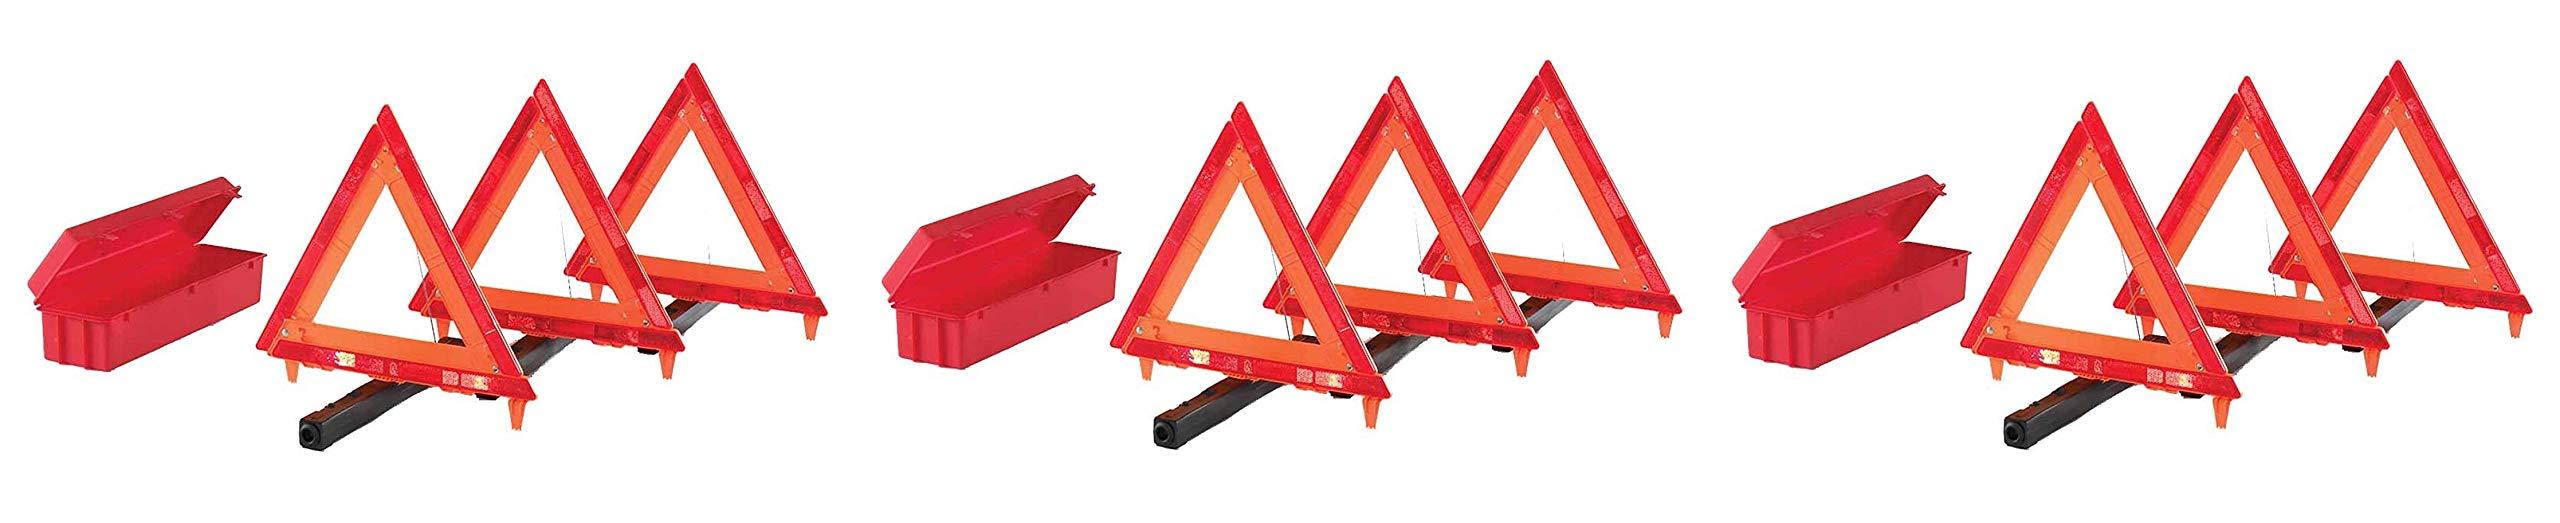 Cortina 95-03-009 3 Piece Triangle Warning Kit (3 Kits)